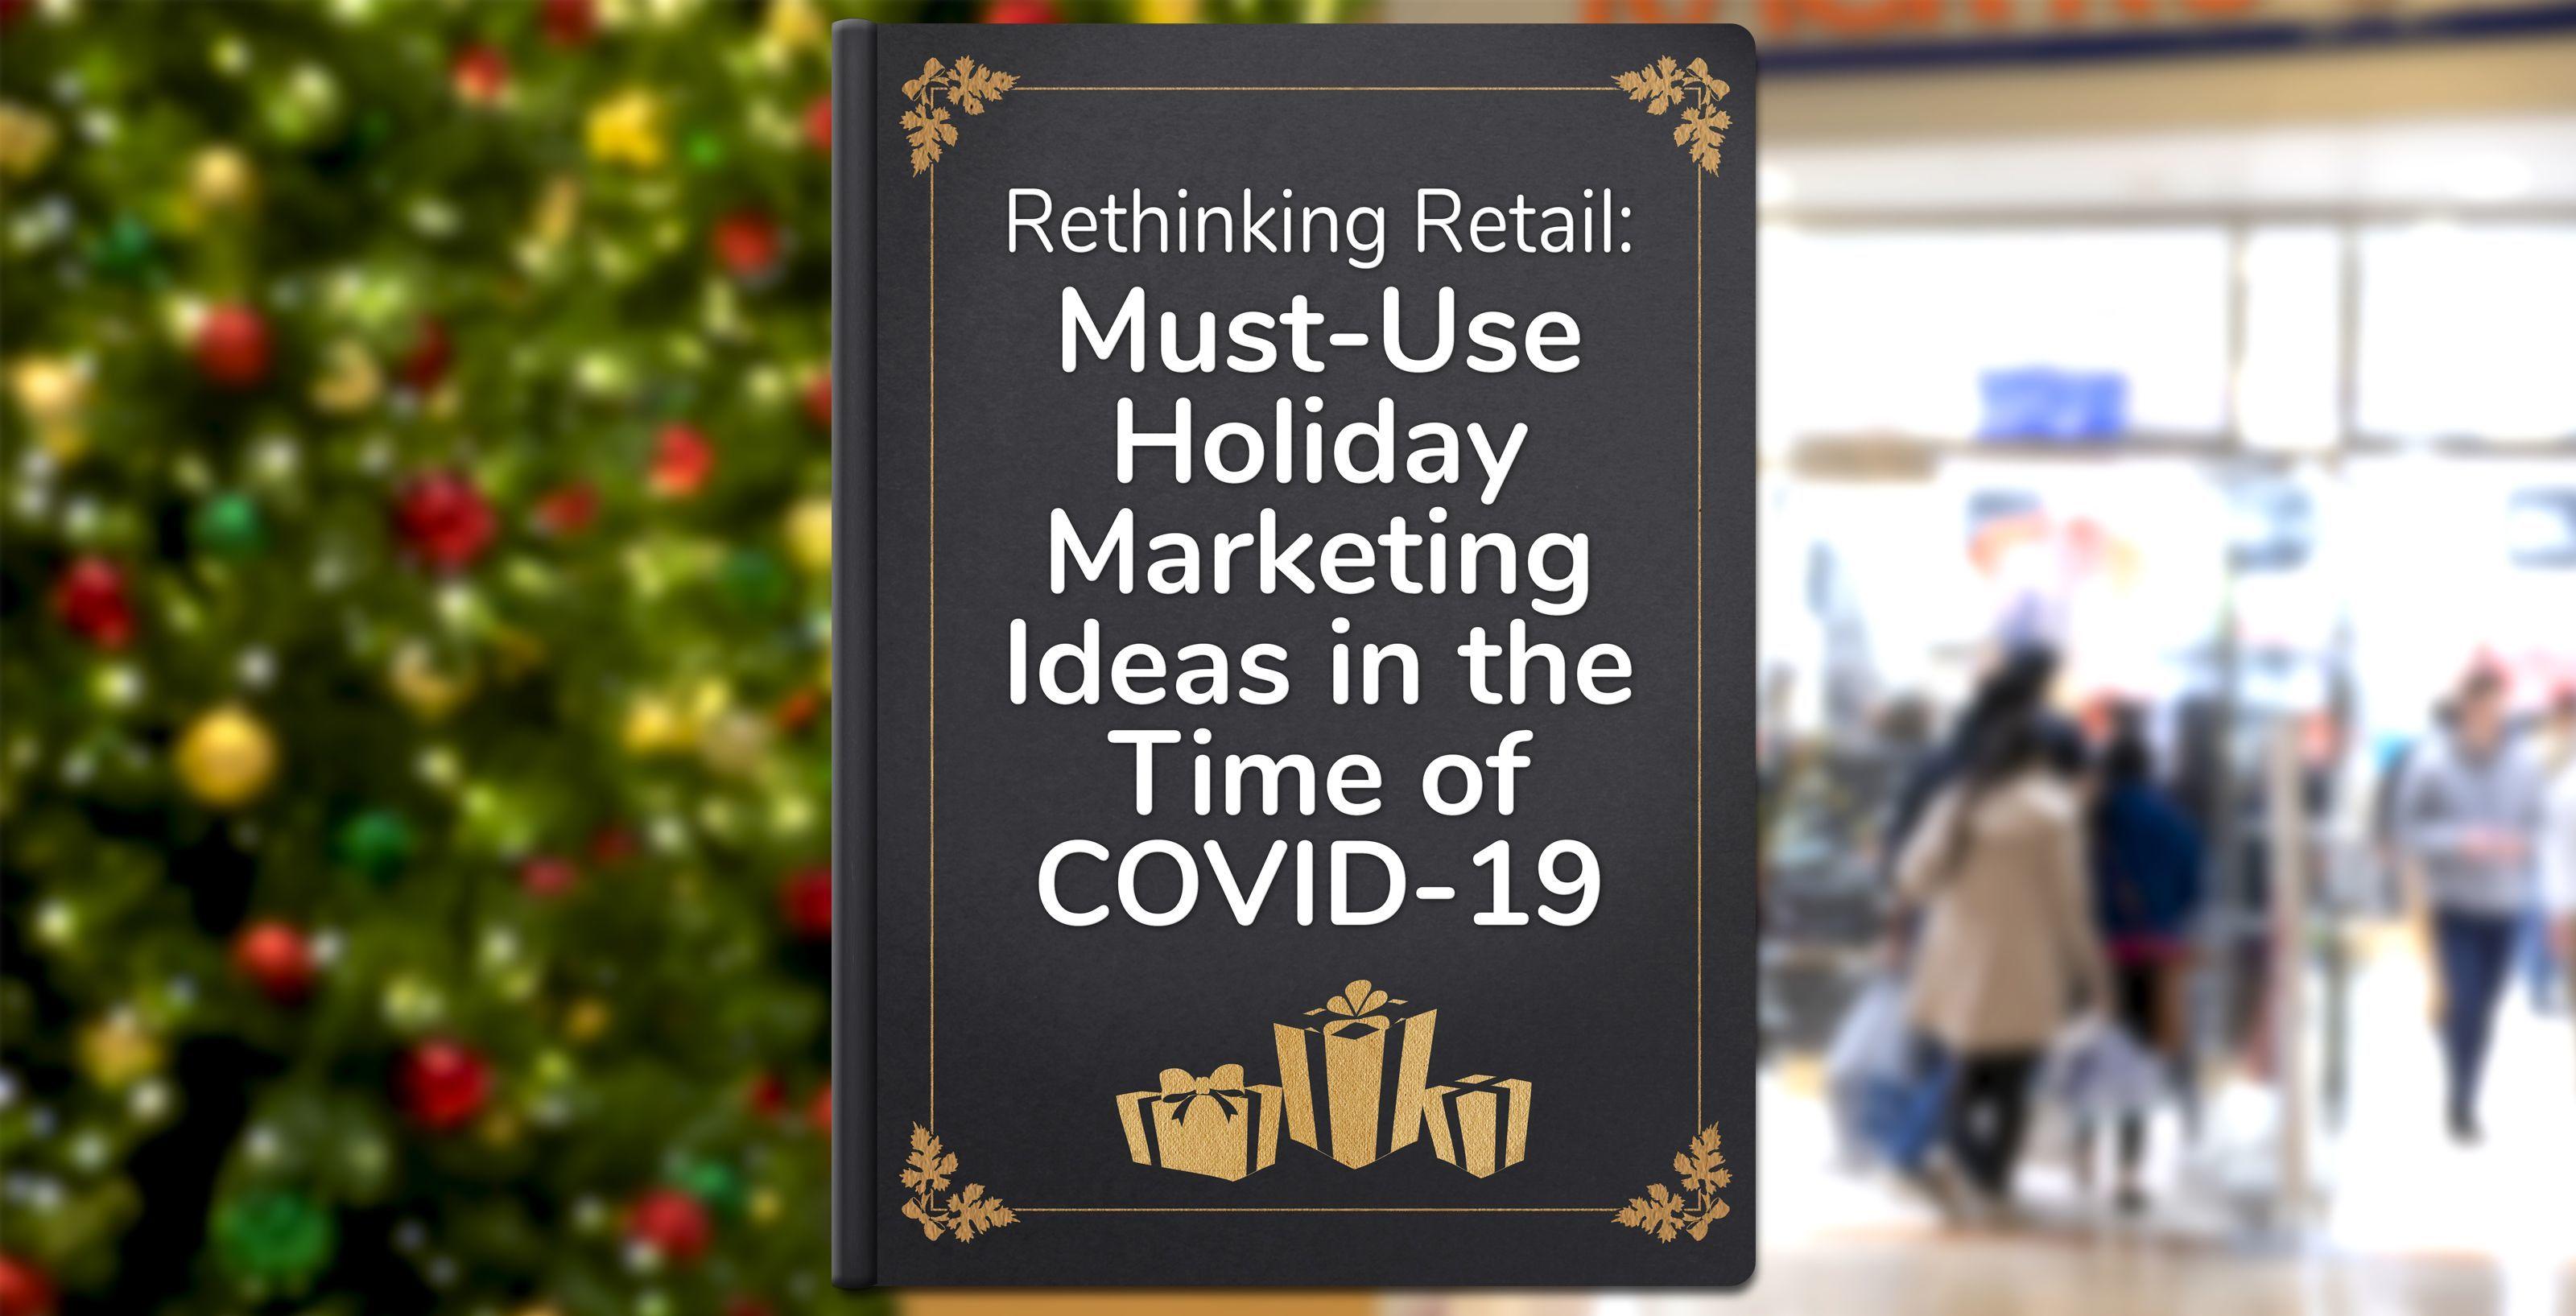 Free Ebook - Rethinking Retail 2020 Holiday Marketing Guide